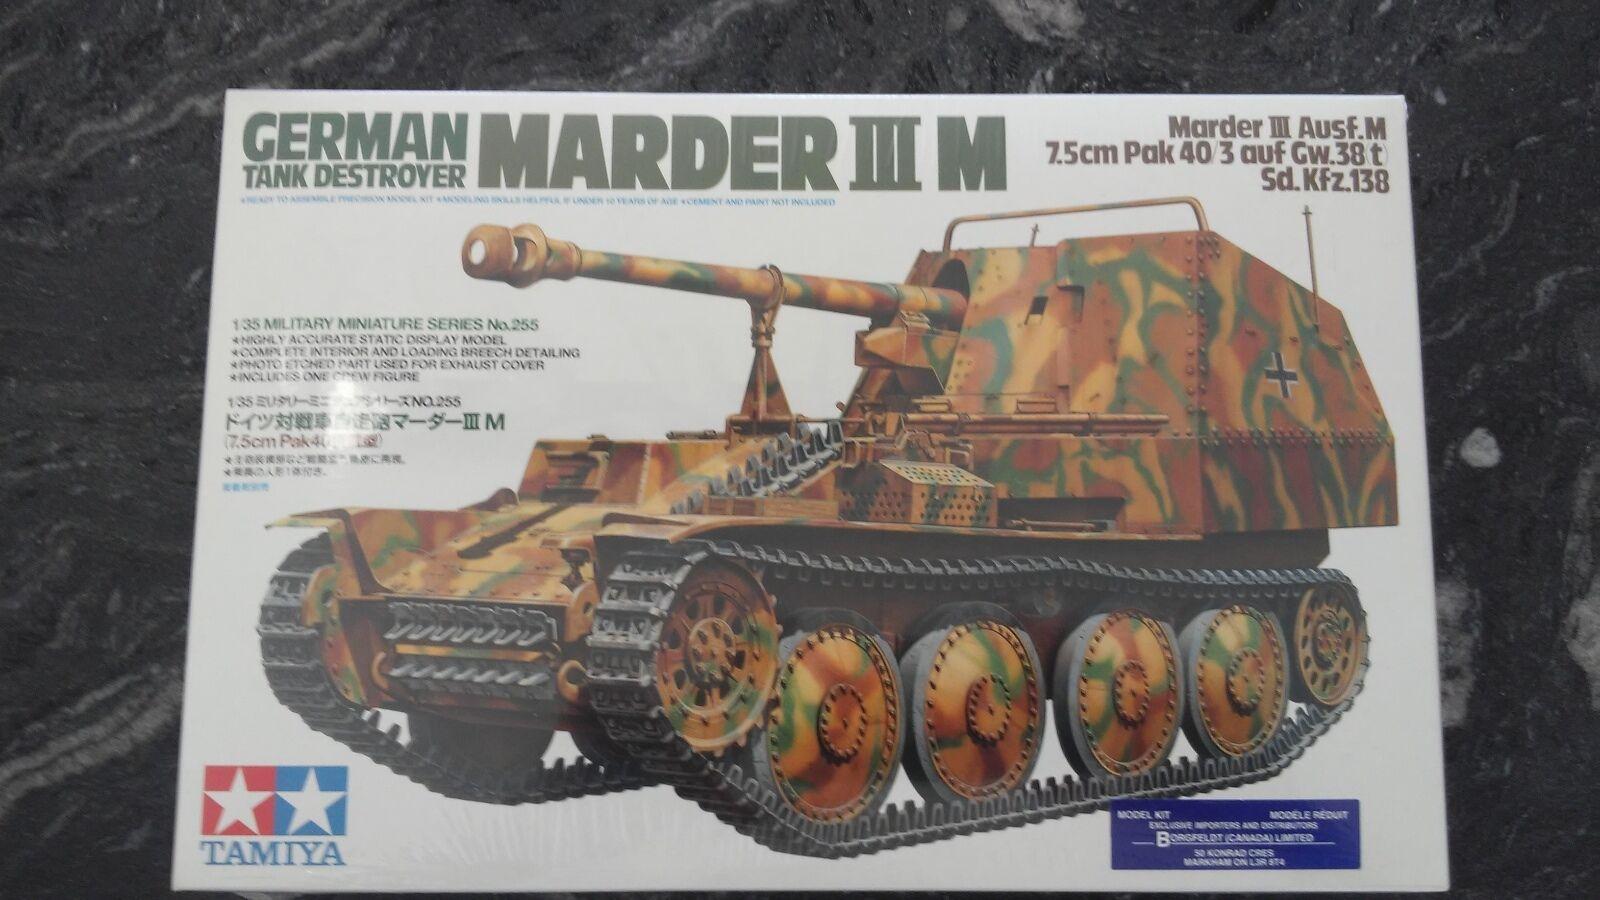 TAMIYA 1 35 WW II GERMAN MARDER III  M TANK DESTROYER MODEL KIT ITEM F S